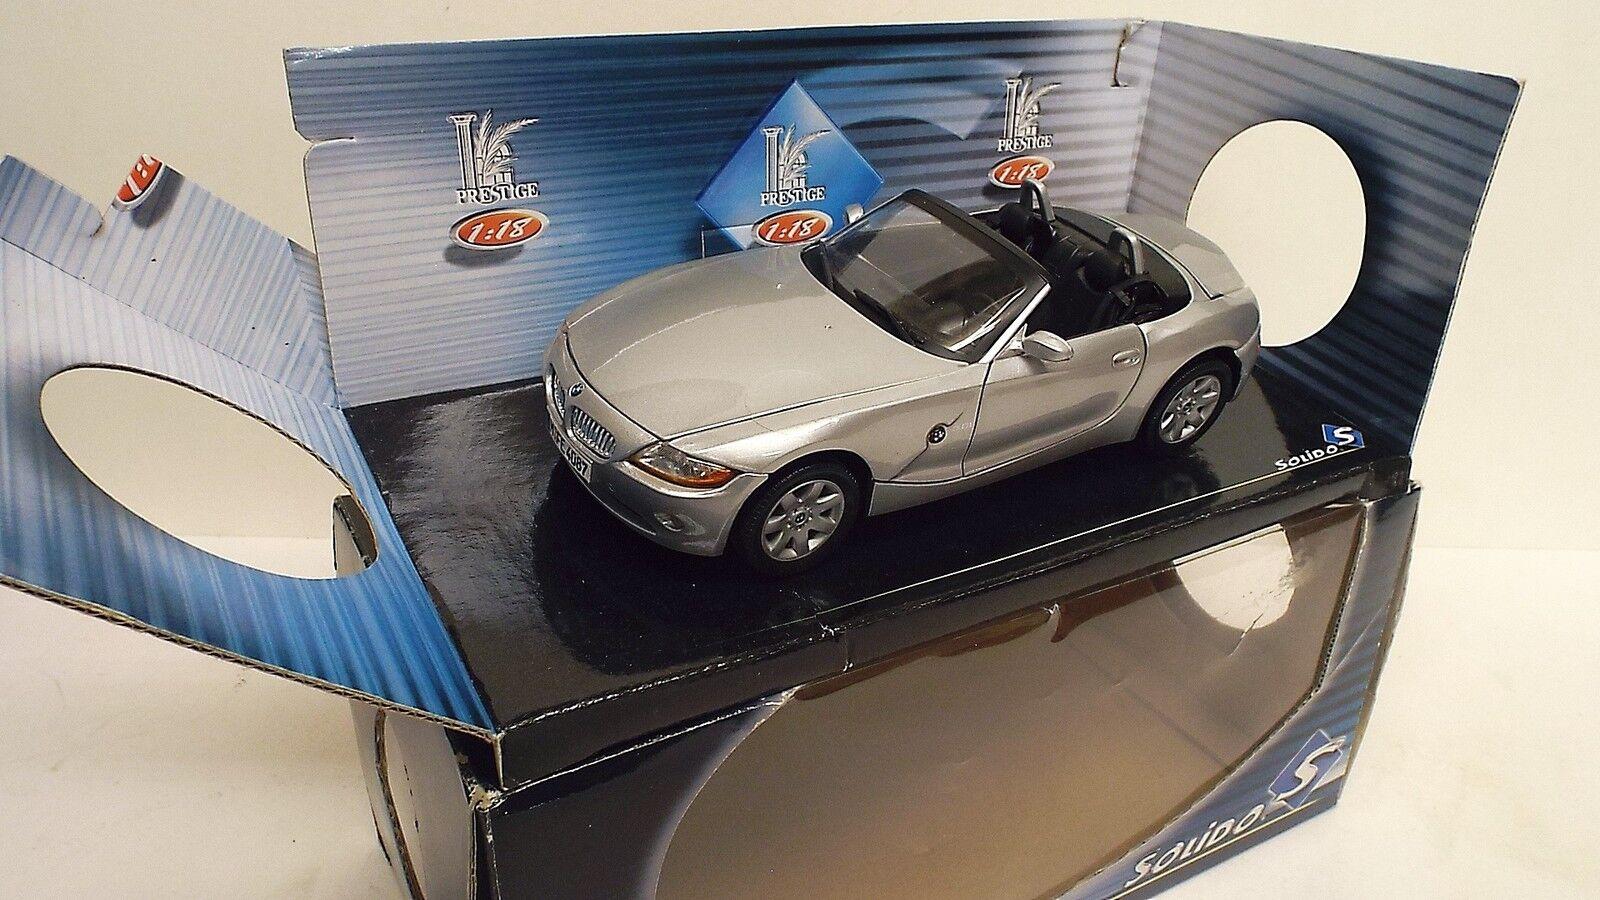 MIRA da solido BMW Z4 3.0i 1:18 Nuovo di zecca in scatola (1/18-65)